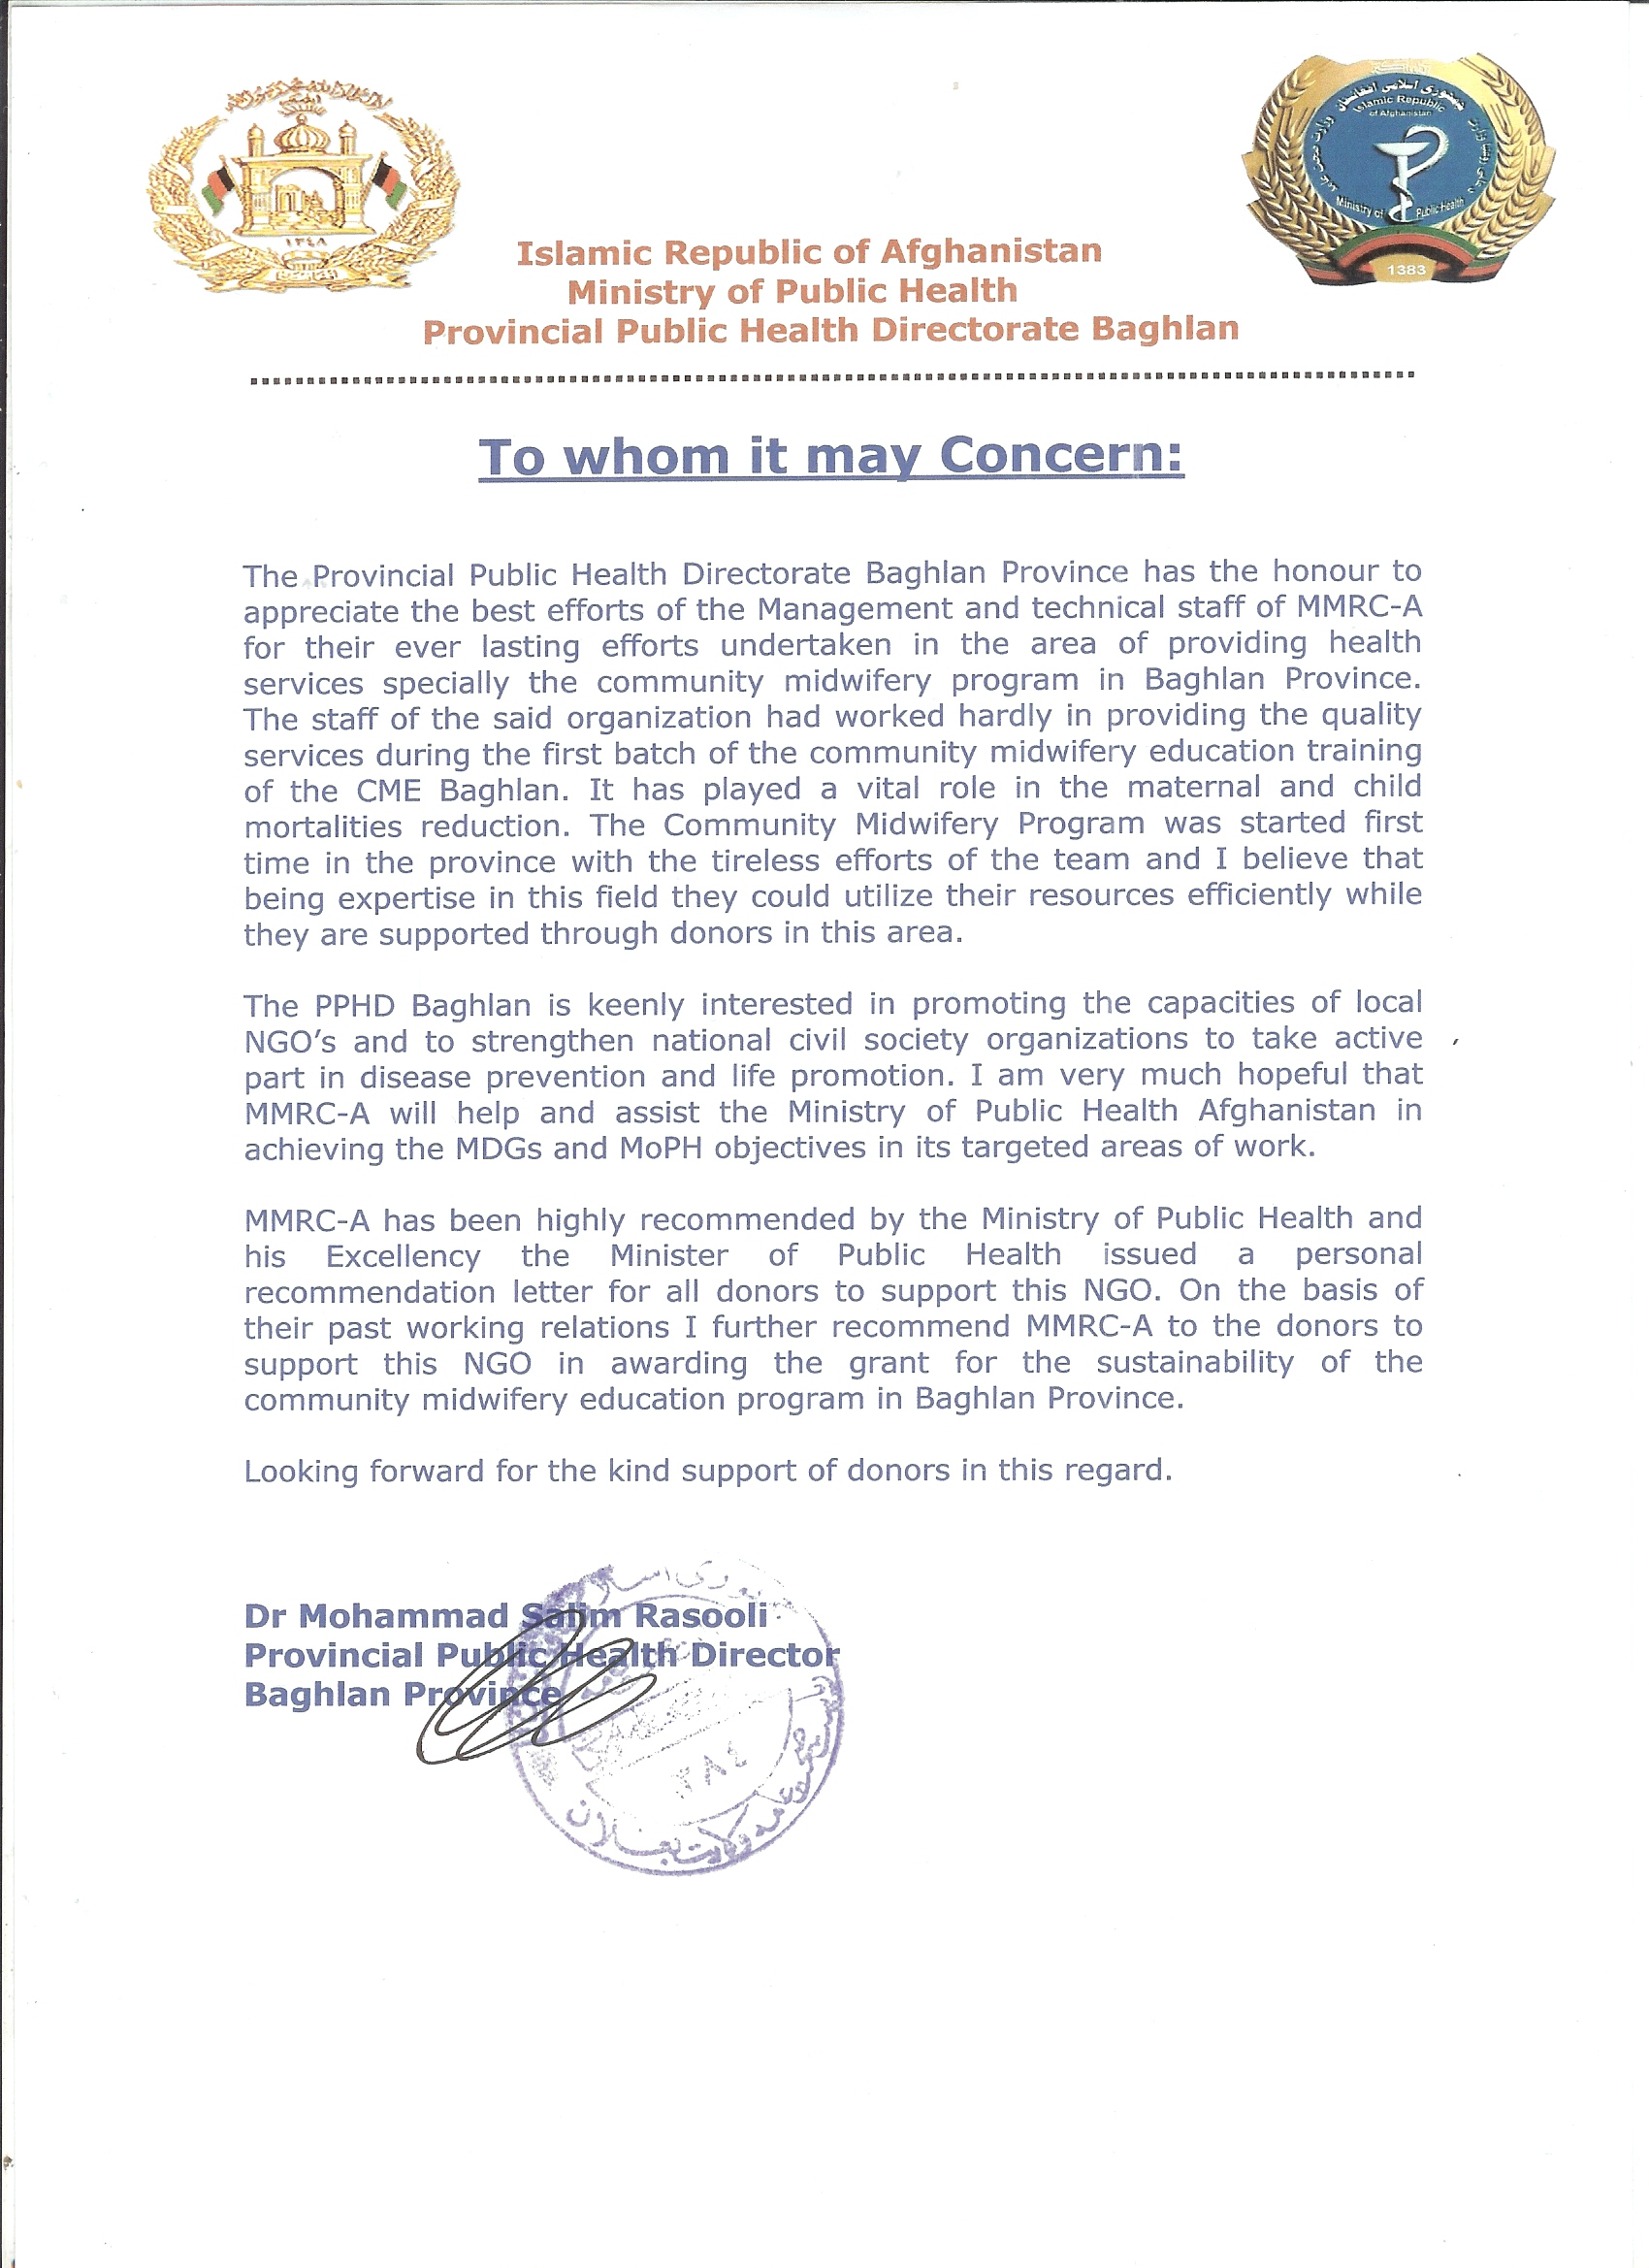 Baghlan PPHD Recommendation Letter